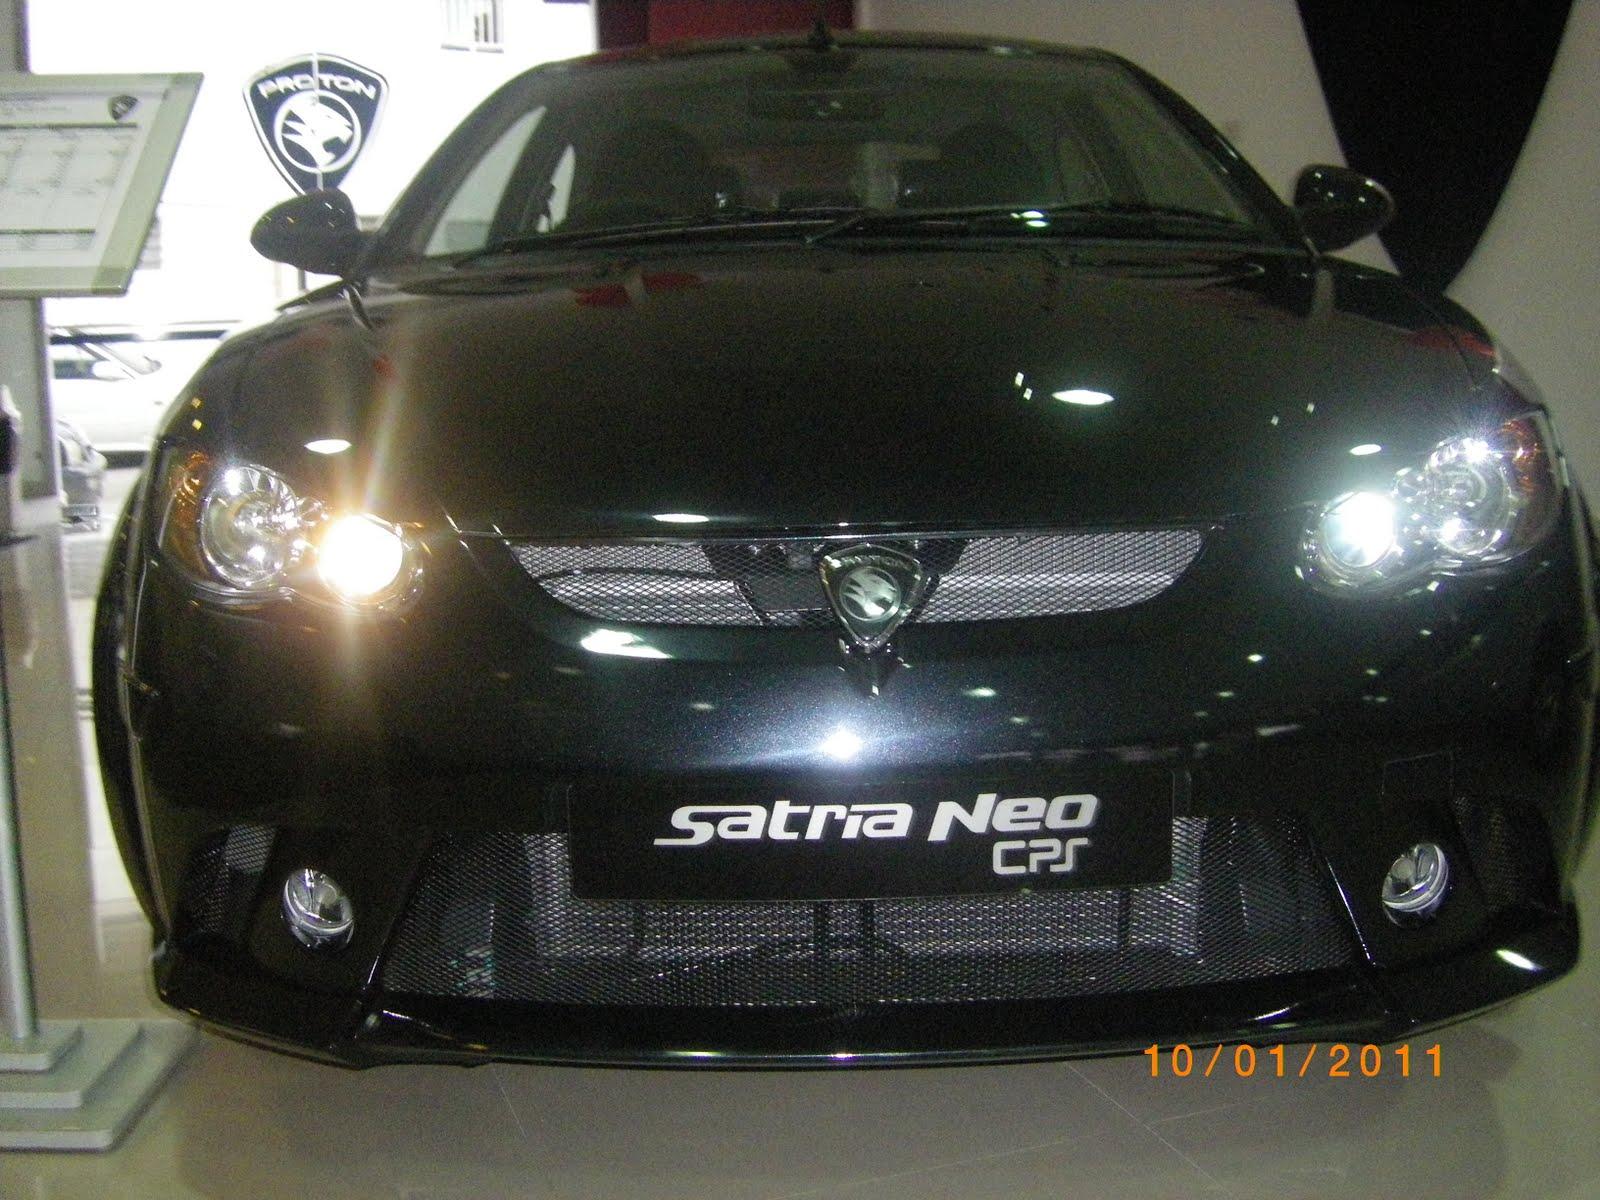 Cps Car Loan >> Loan 100 Utk Graduan Gorverment Server Glc Satria Neo